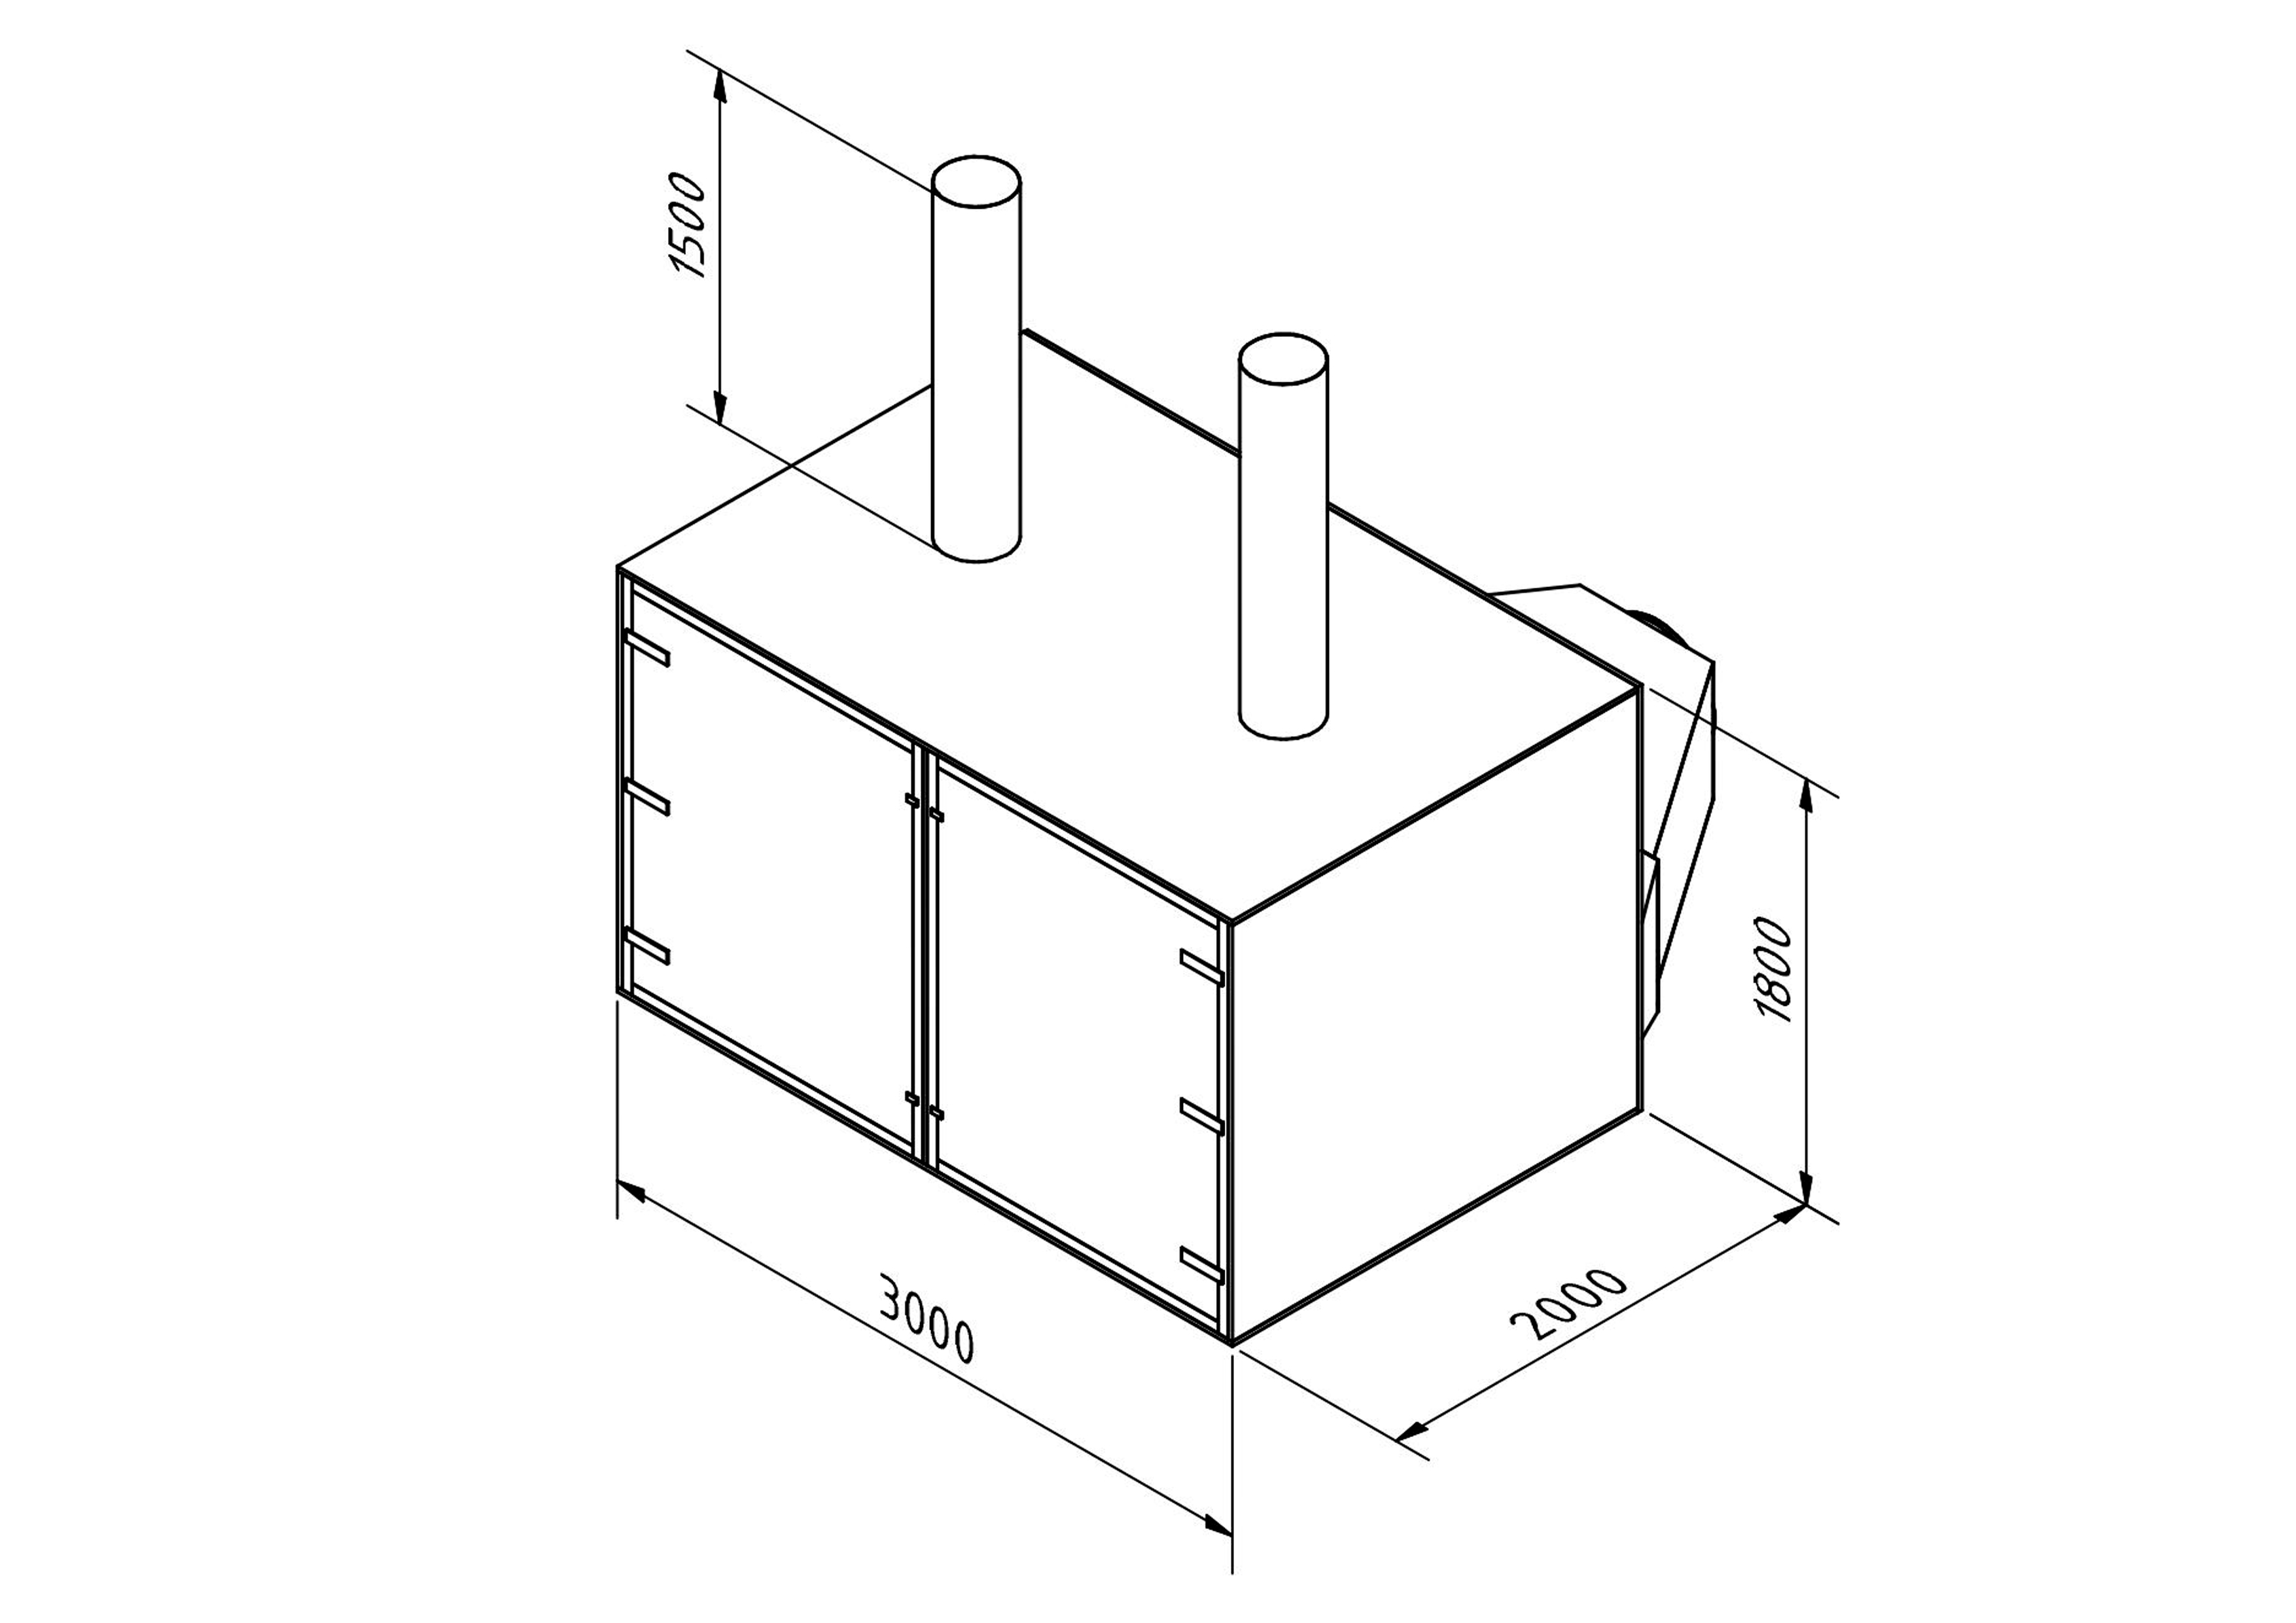 Pac btd batch-tray-dryer 0000.jpg